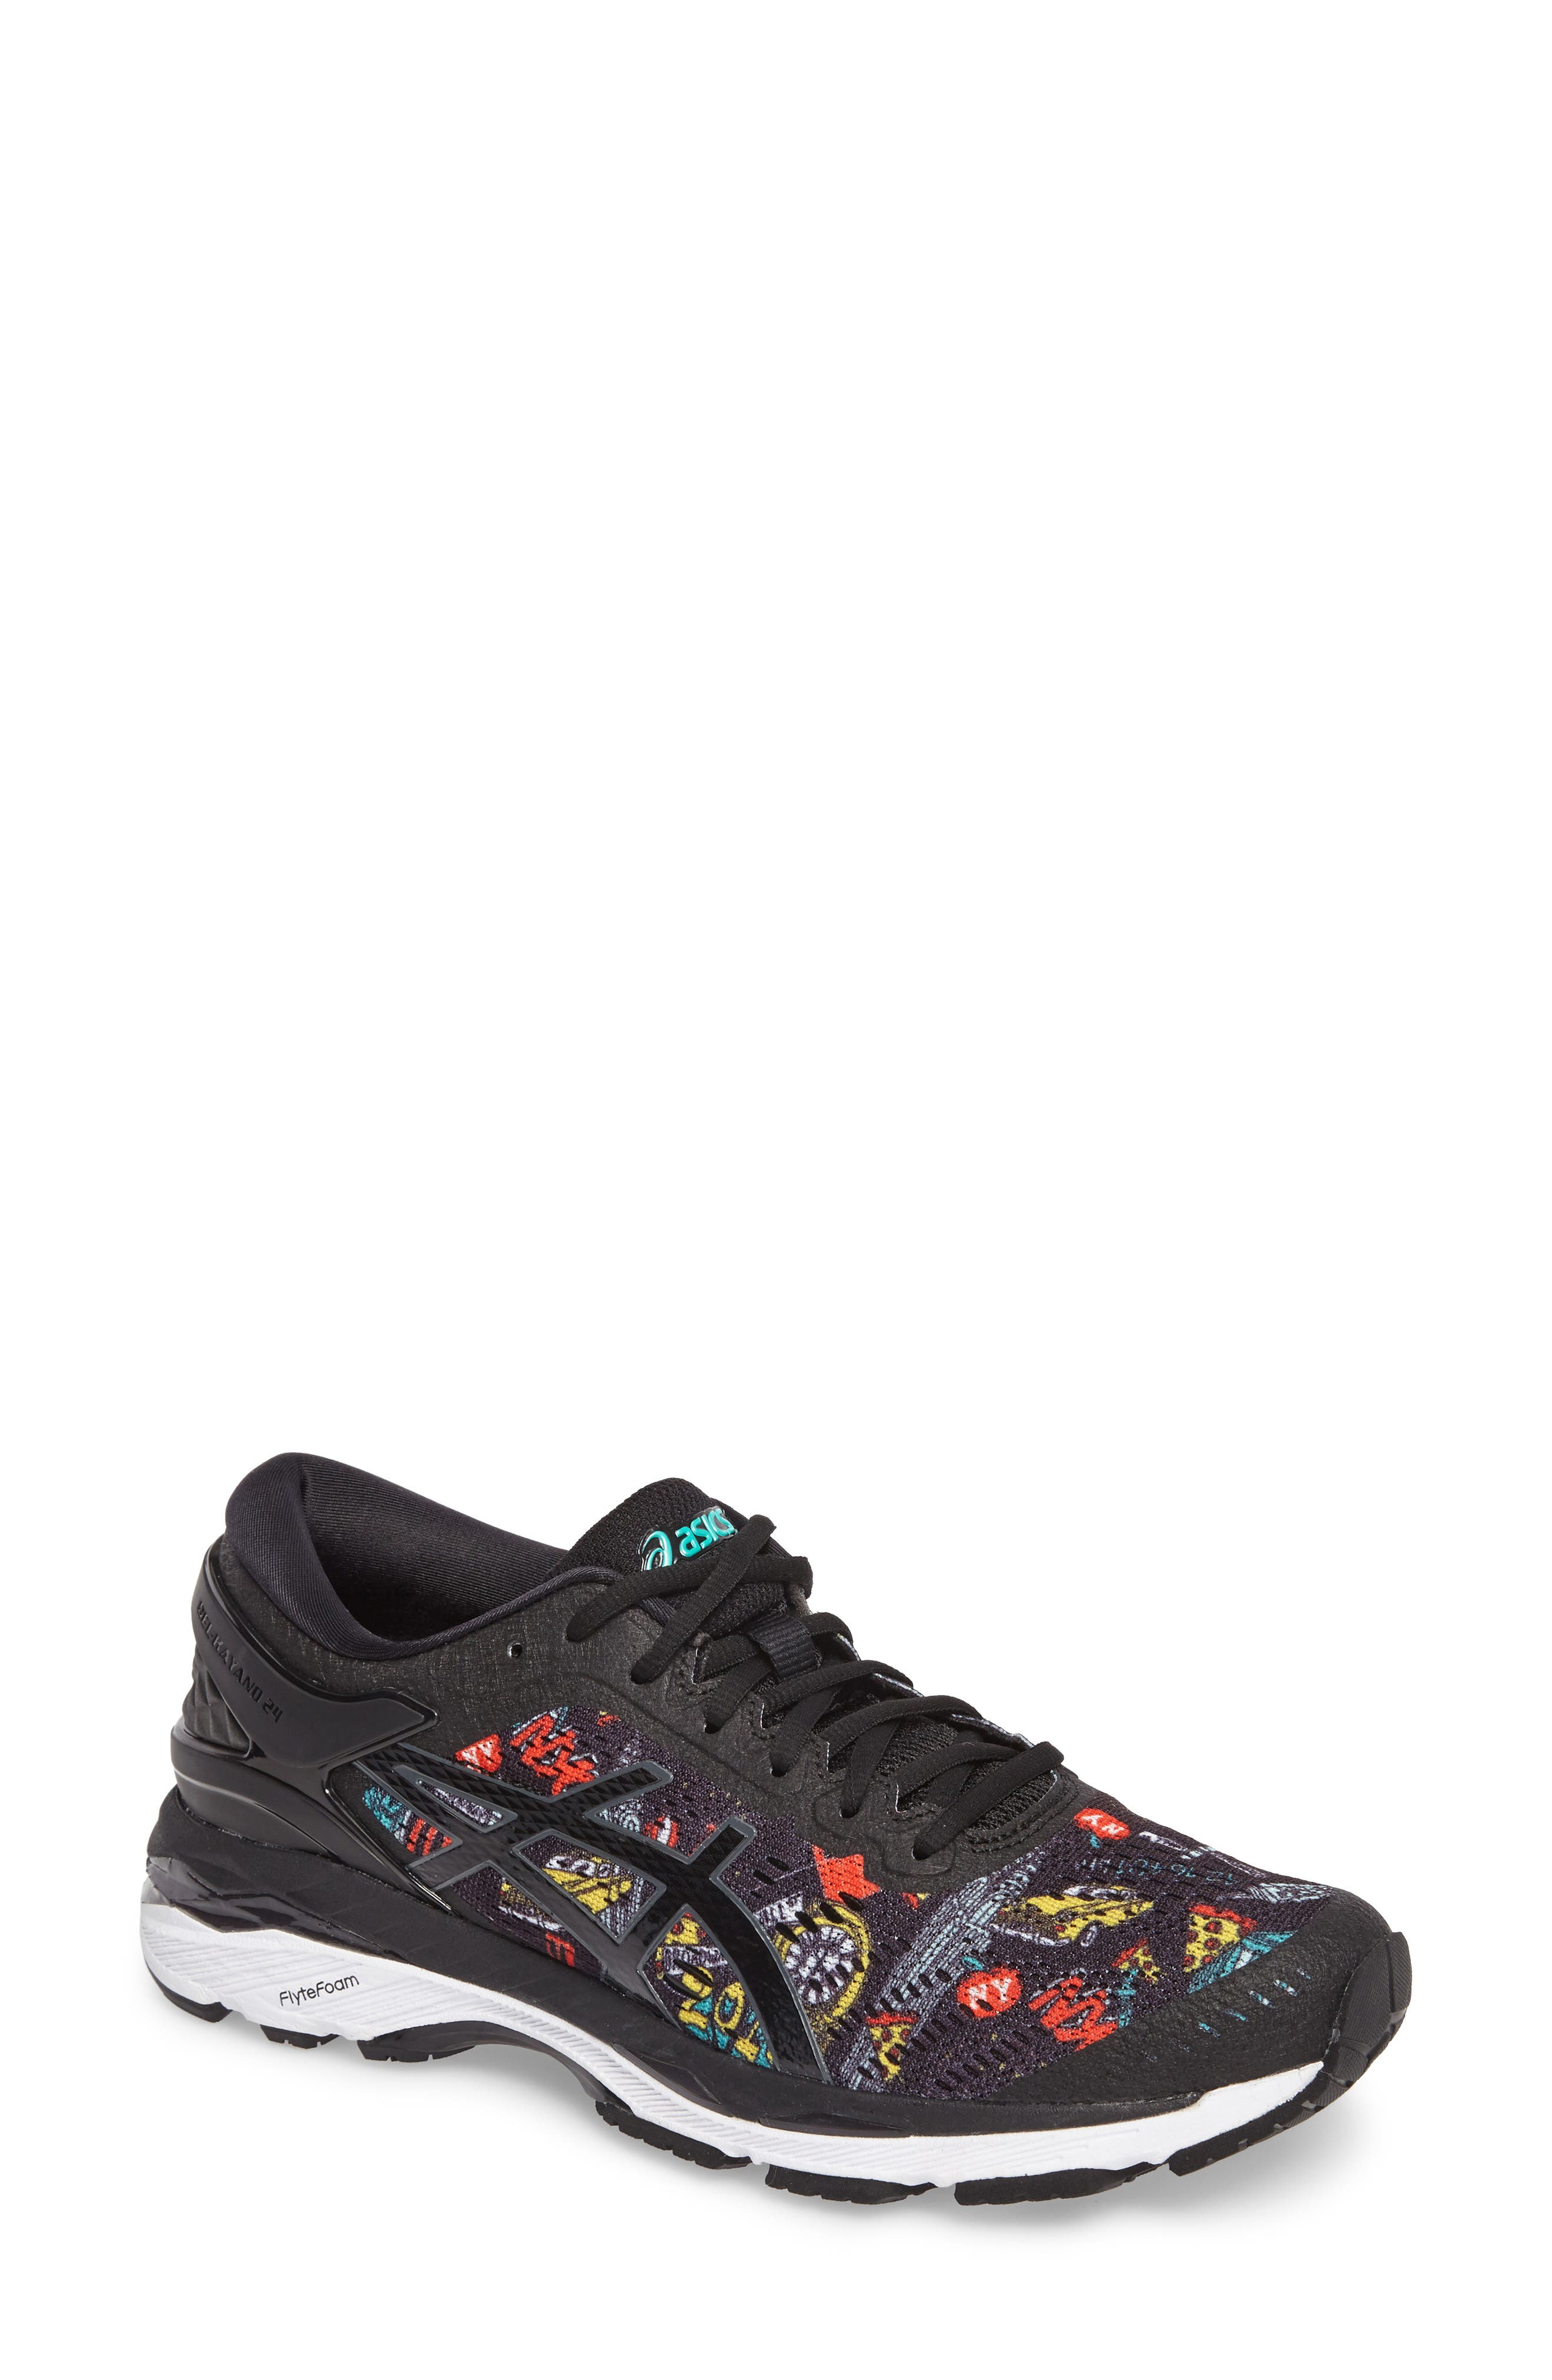 GEL-Kayano<sup>®</sup> 24 Running Shoe,                         Main,                         color, 009